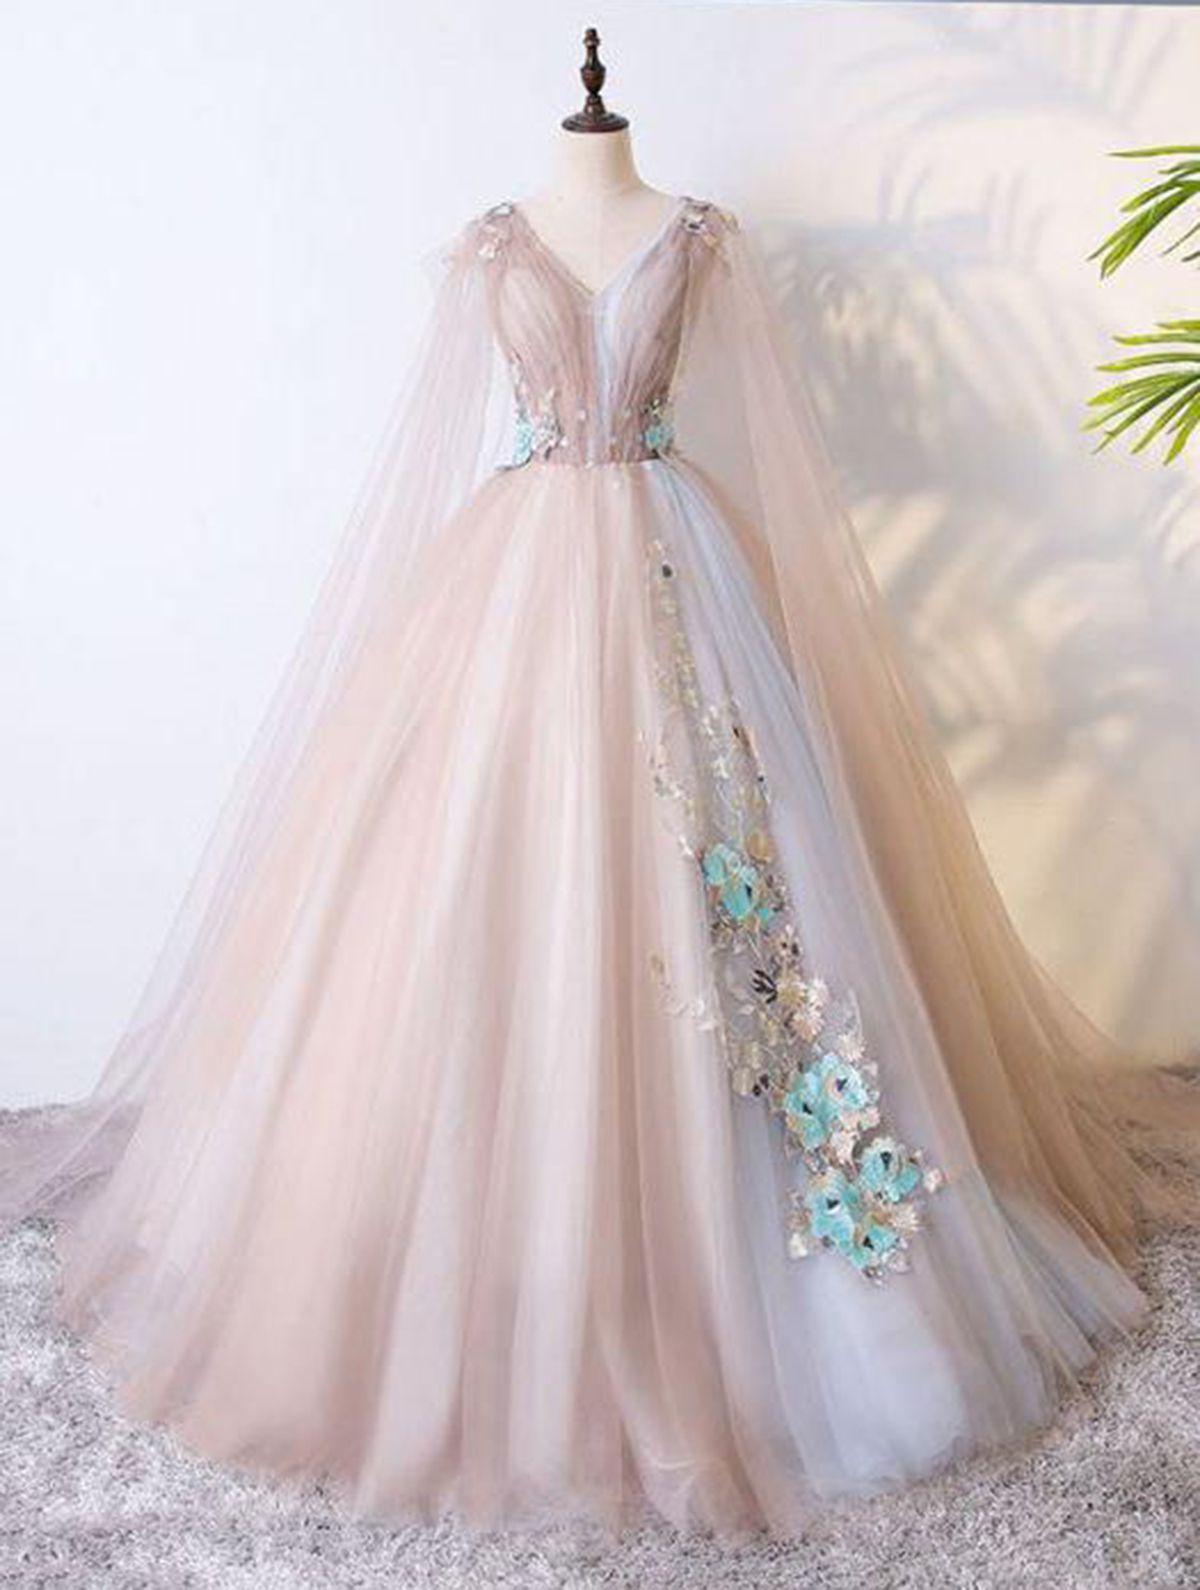 1d333c20e55d5 File_0e73805cdd_original   beautiful gowns & Dresses   Dresses ...